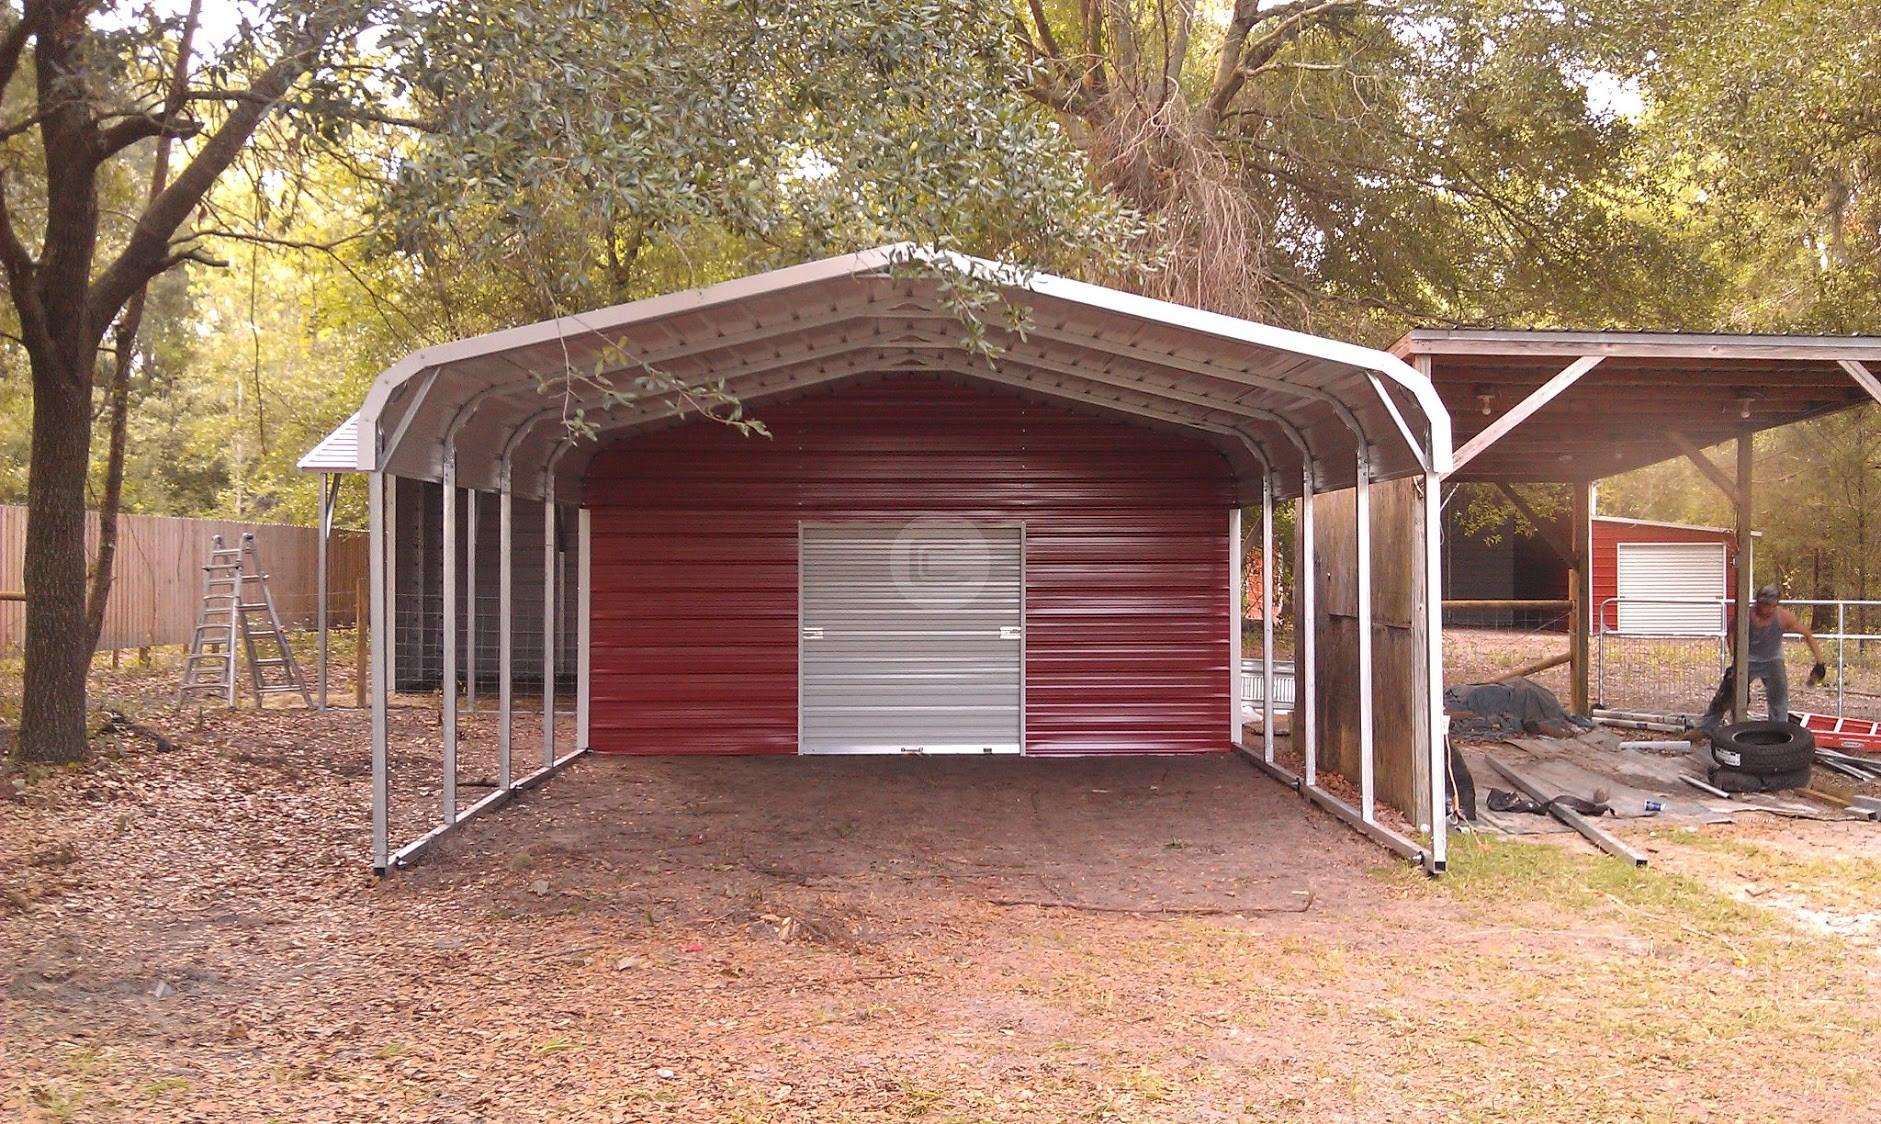 Metal Carport Barns : Creative uses and differences metal carports enclosed